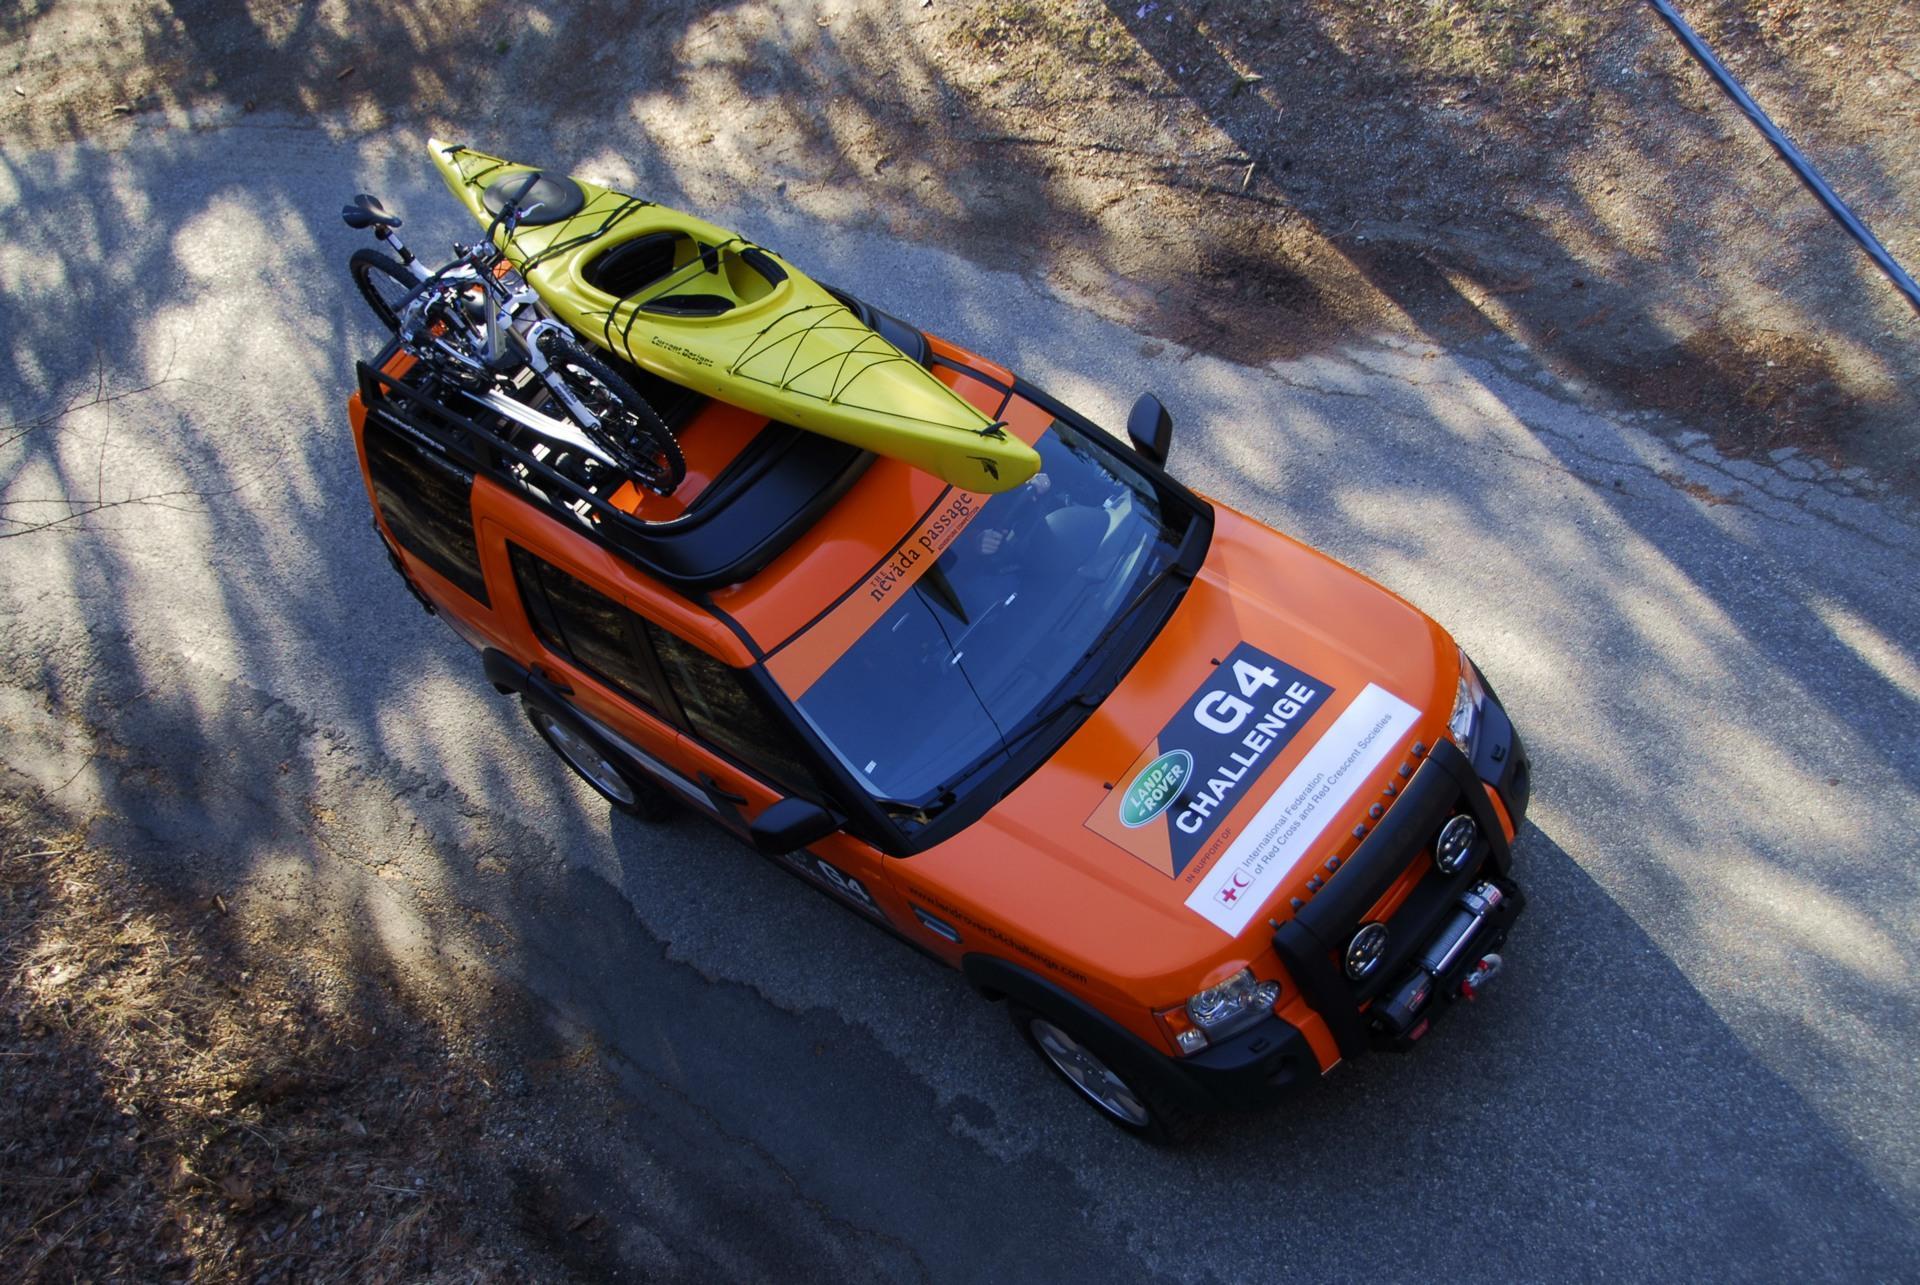 State Road Auto Sales >> 2008 Land Rover LR3 G4 Challenge - conceptcarz.com